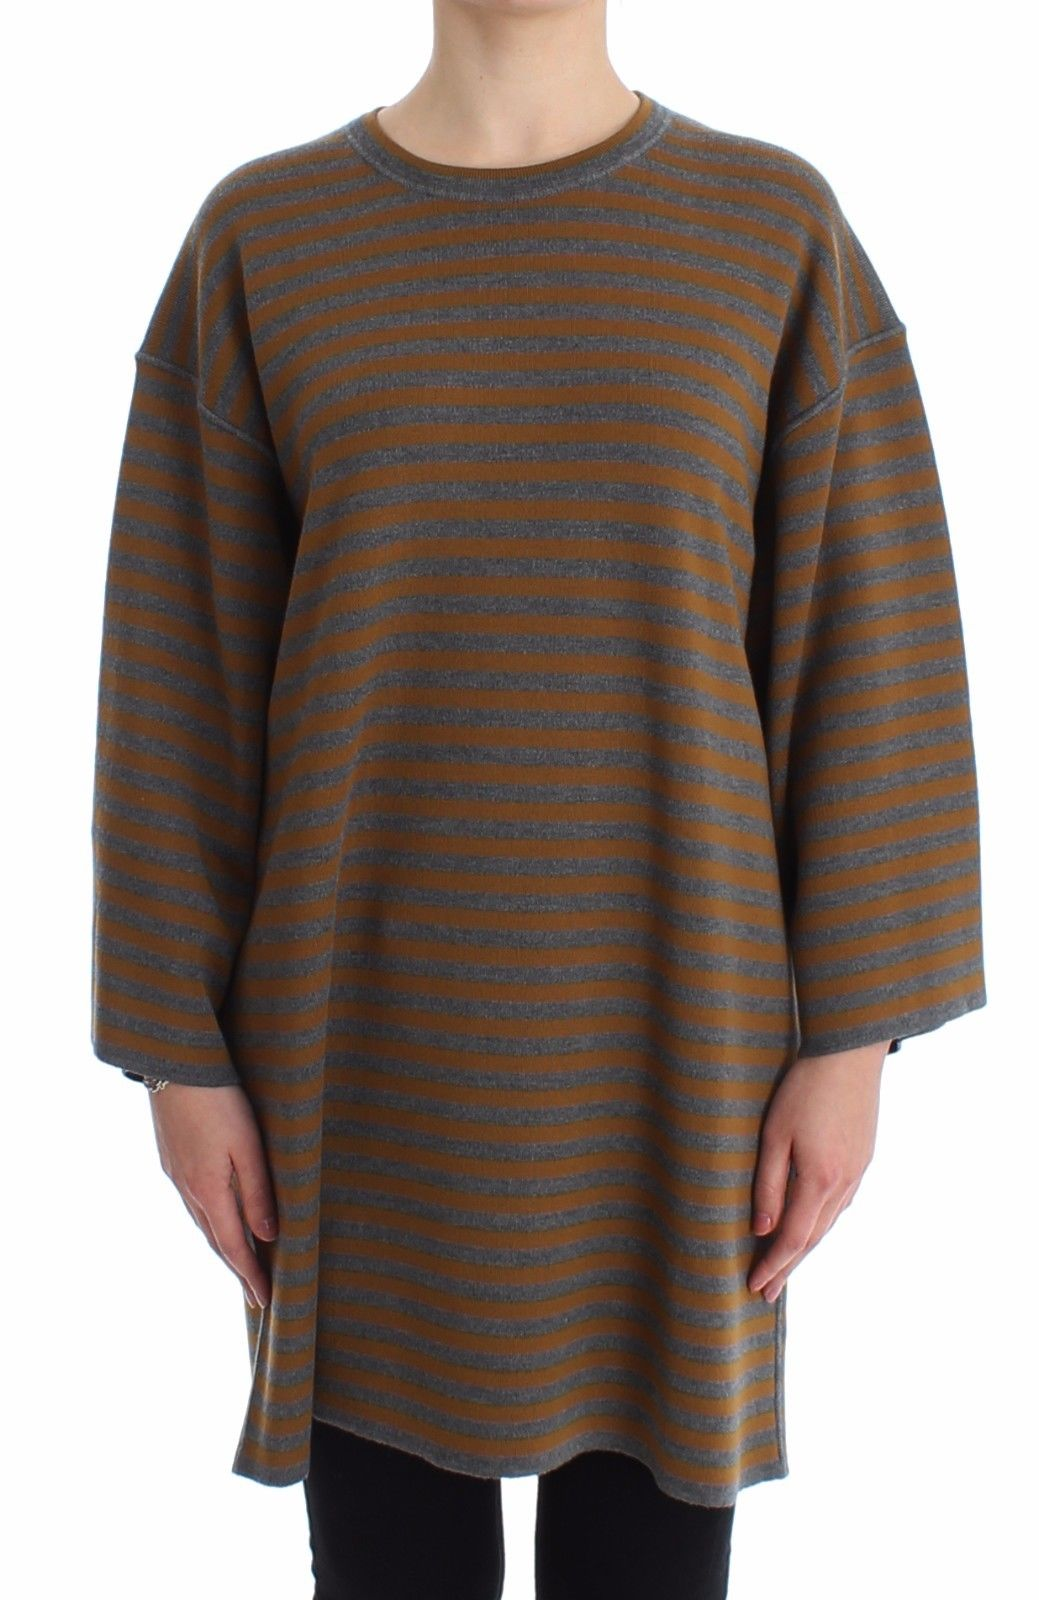 Dolce & Gabbana Women's Oversized Striped Top Gray SIG13232 - IT40| L